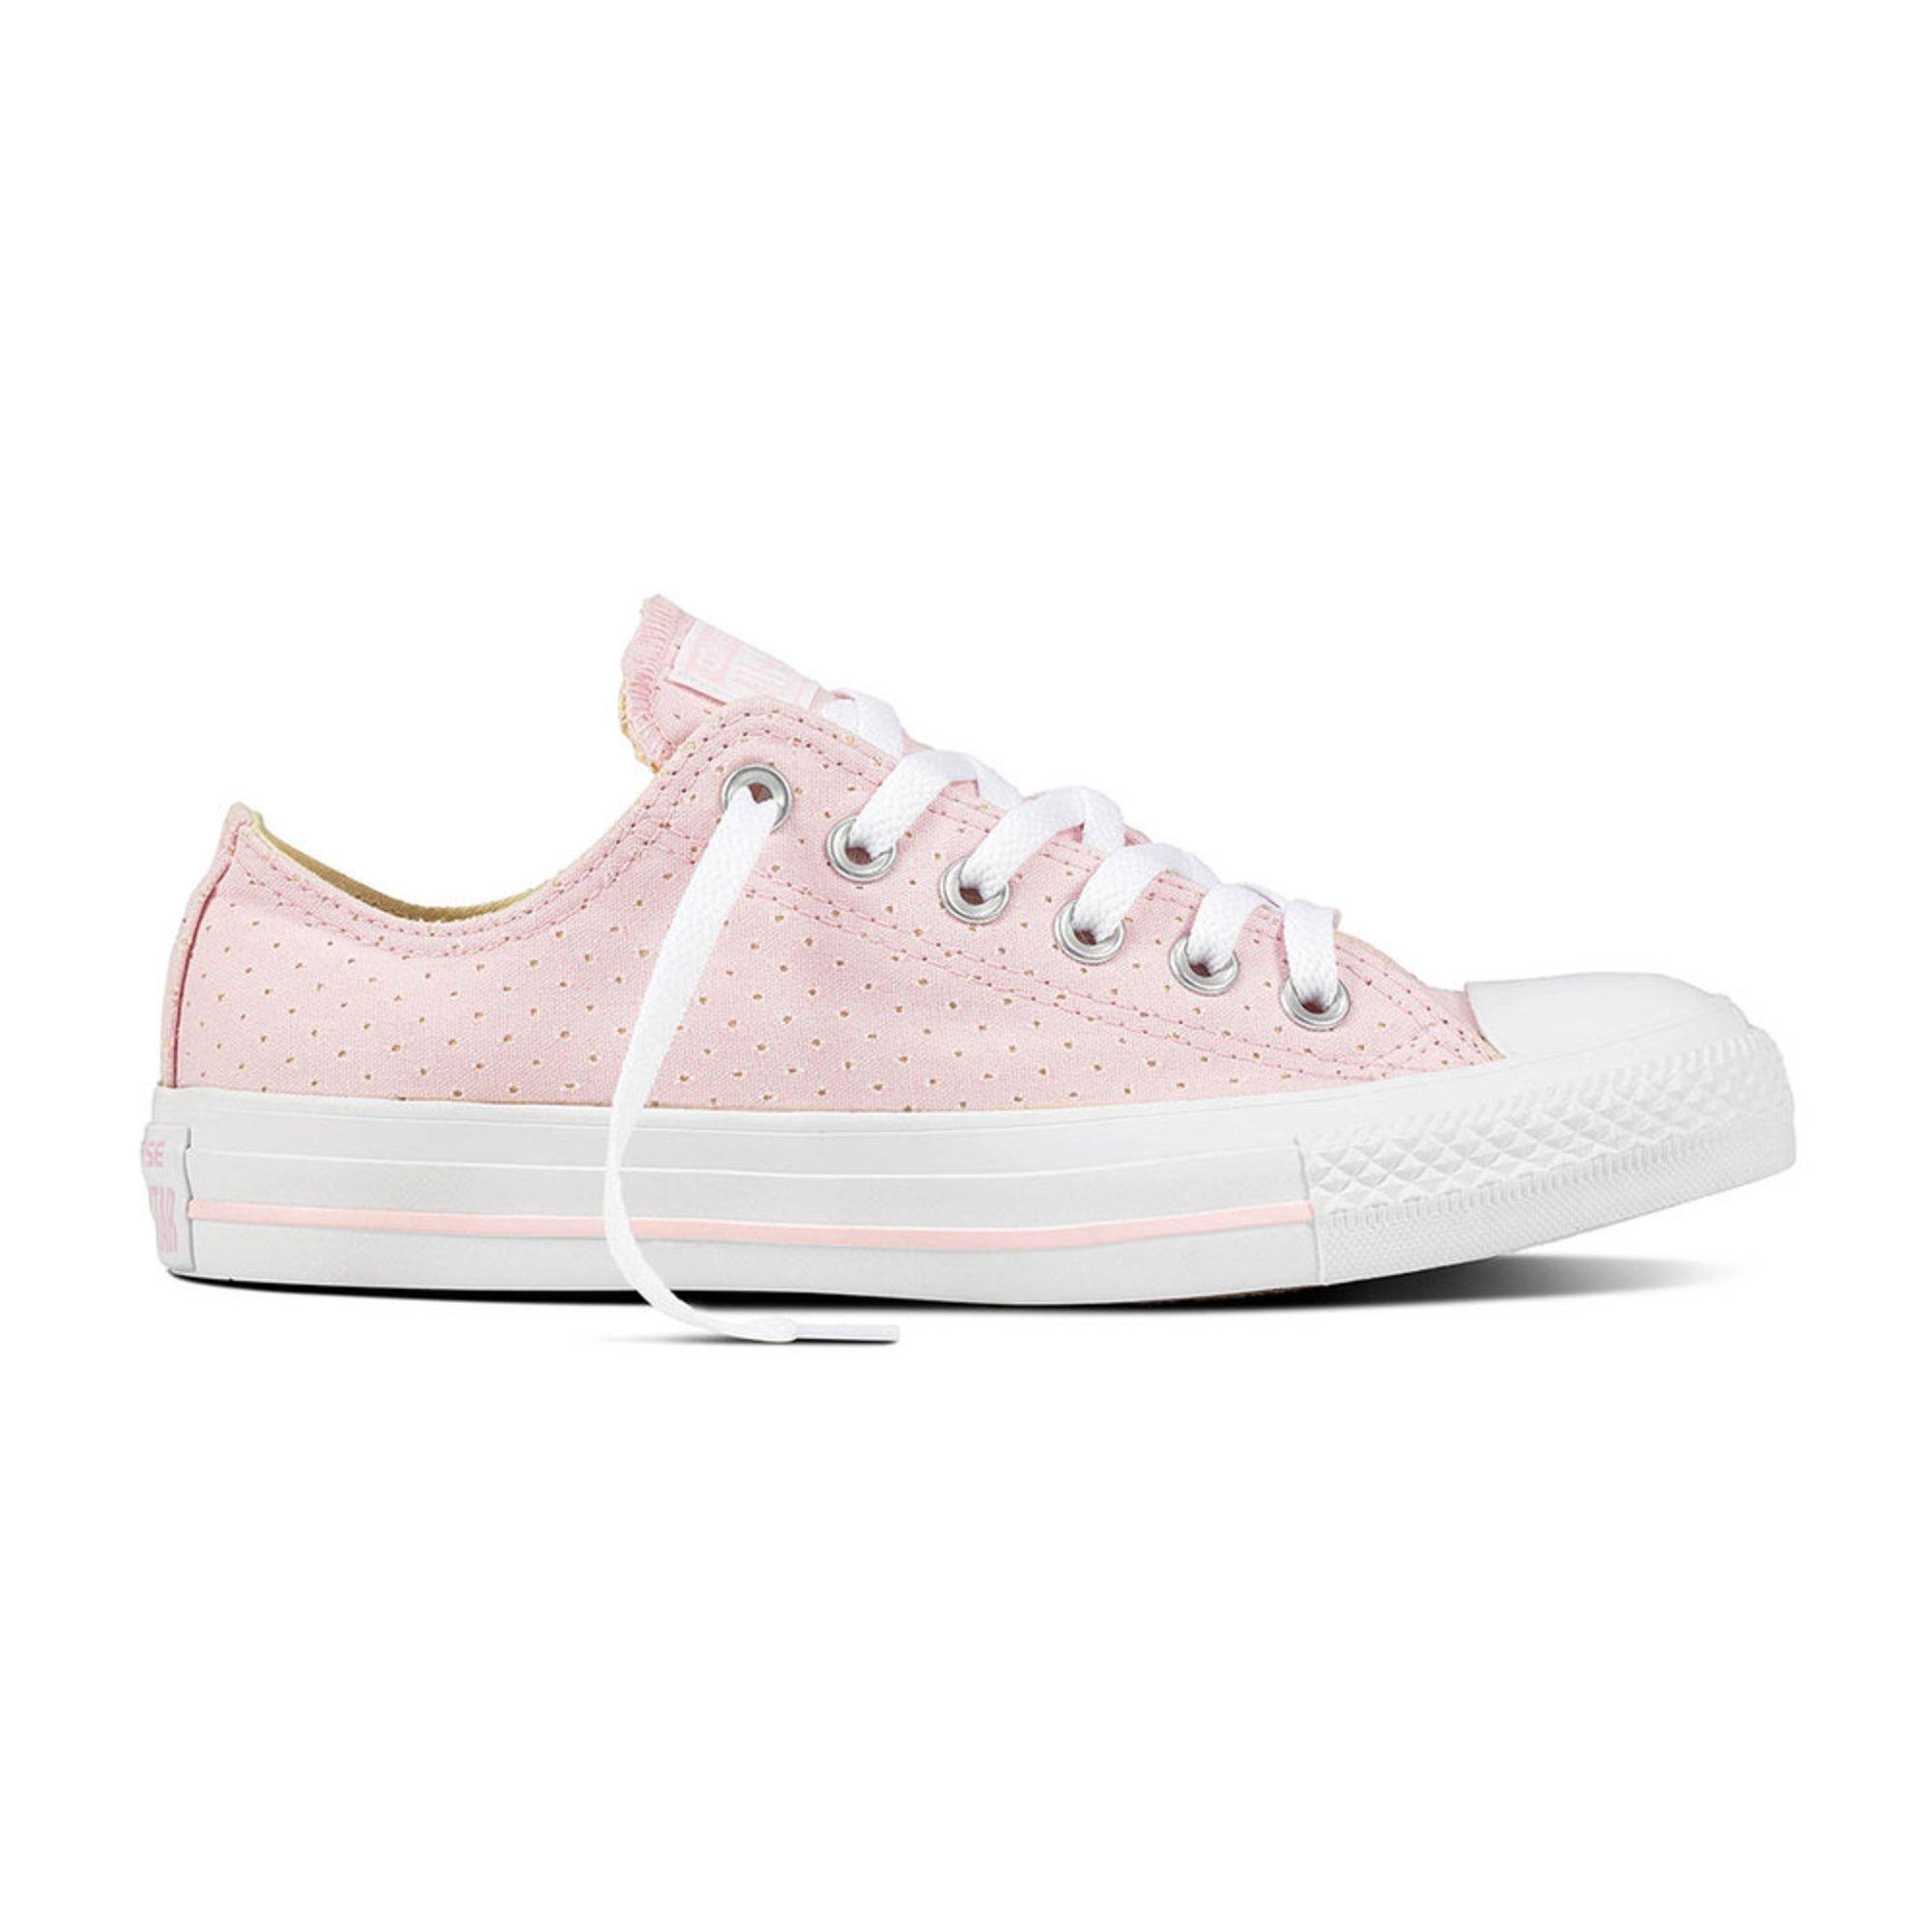 d3caedf426e0 Converse. Converse Women s Chuck Taylor All Star Sneaker